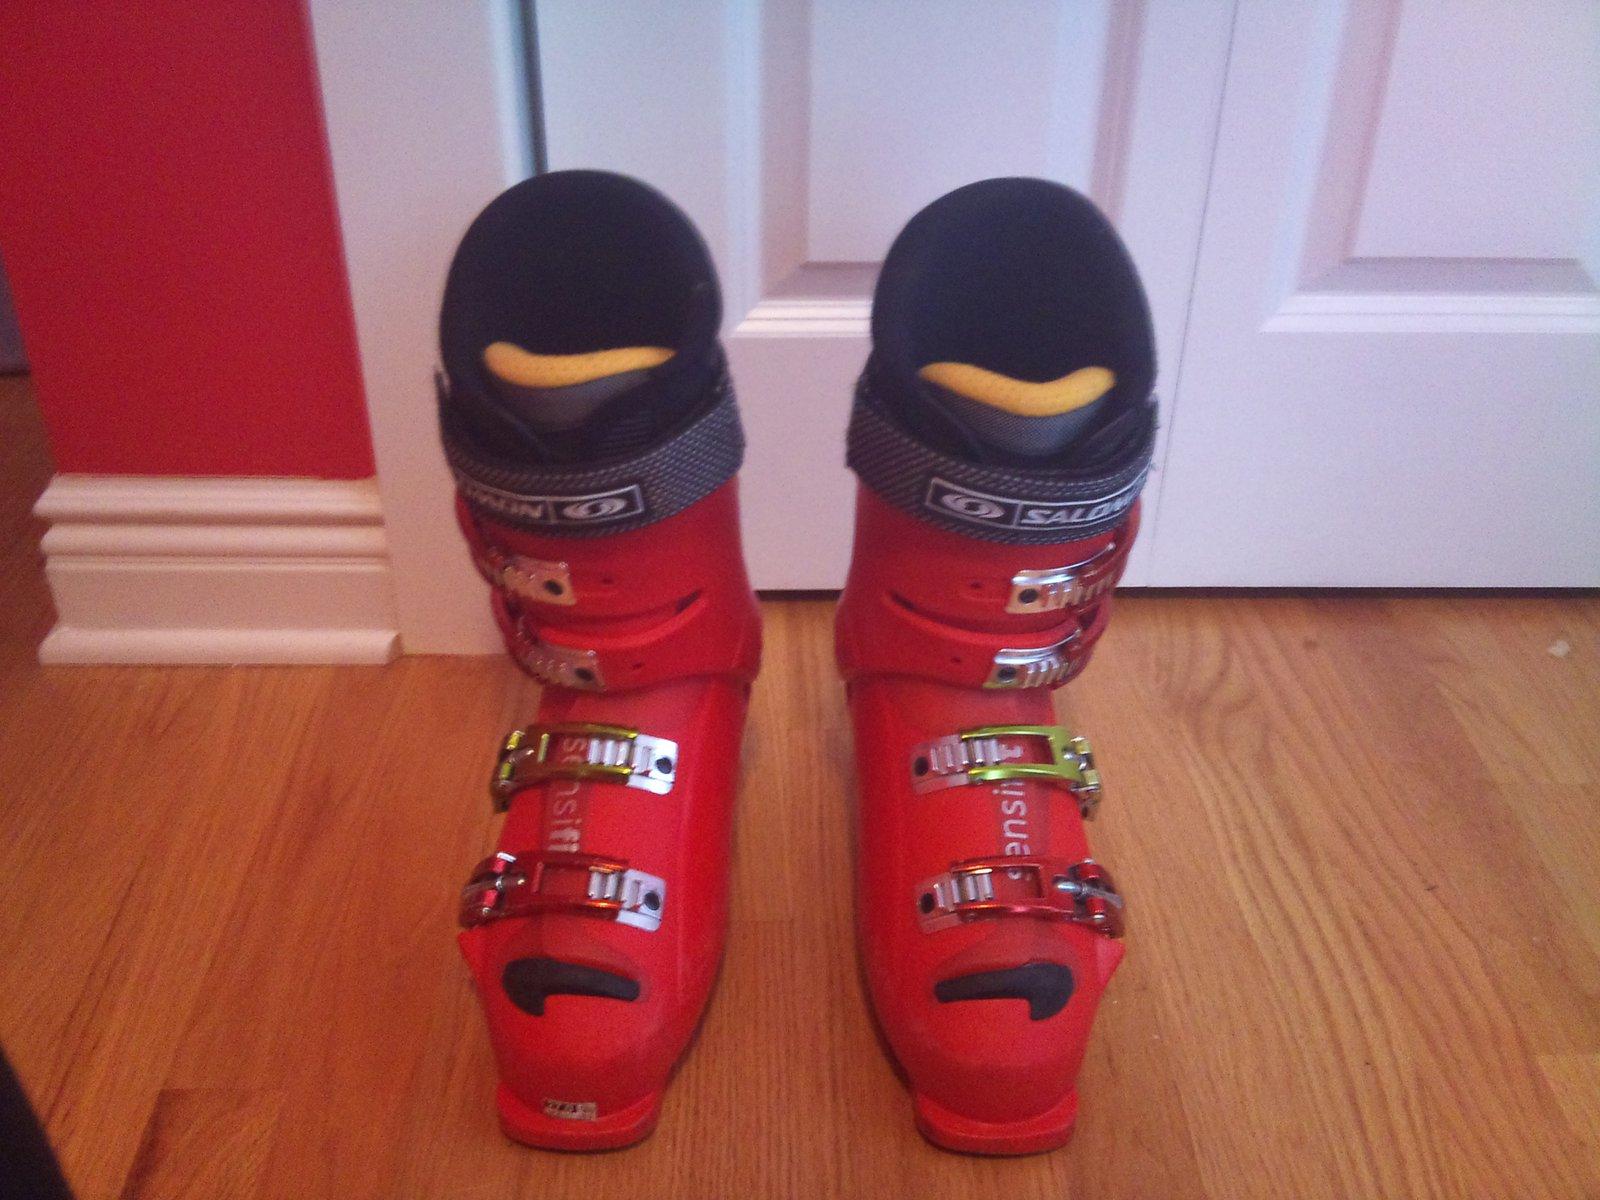 Salomon X wave 10 ski boots size 9